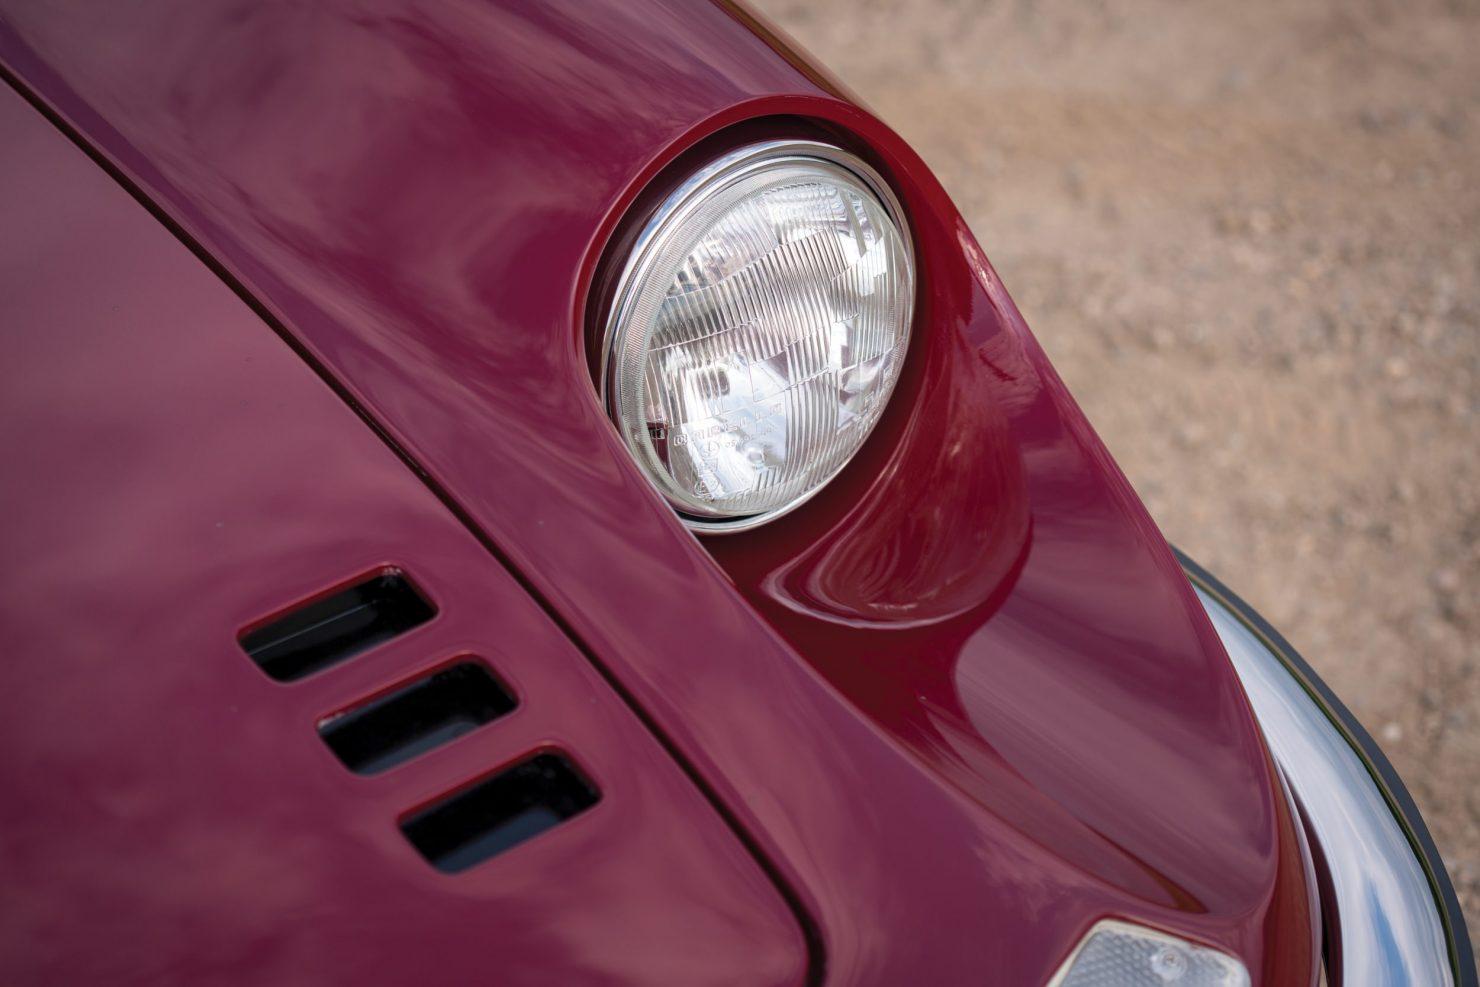 ferrari dino 246 20 1480x987 - 1969 Ferrari Dino 246 GT